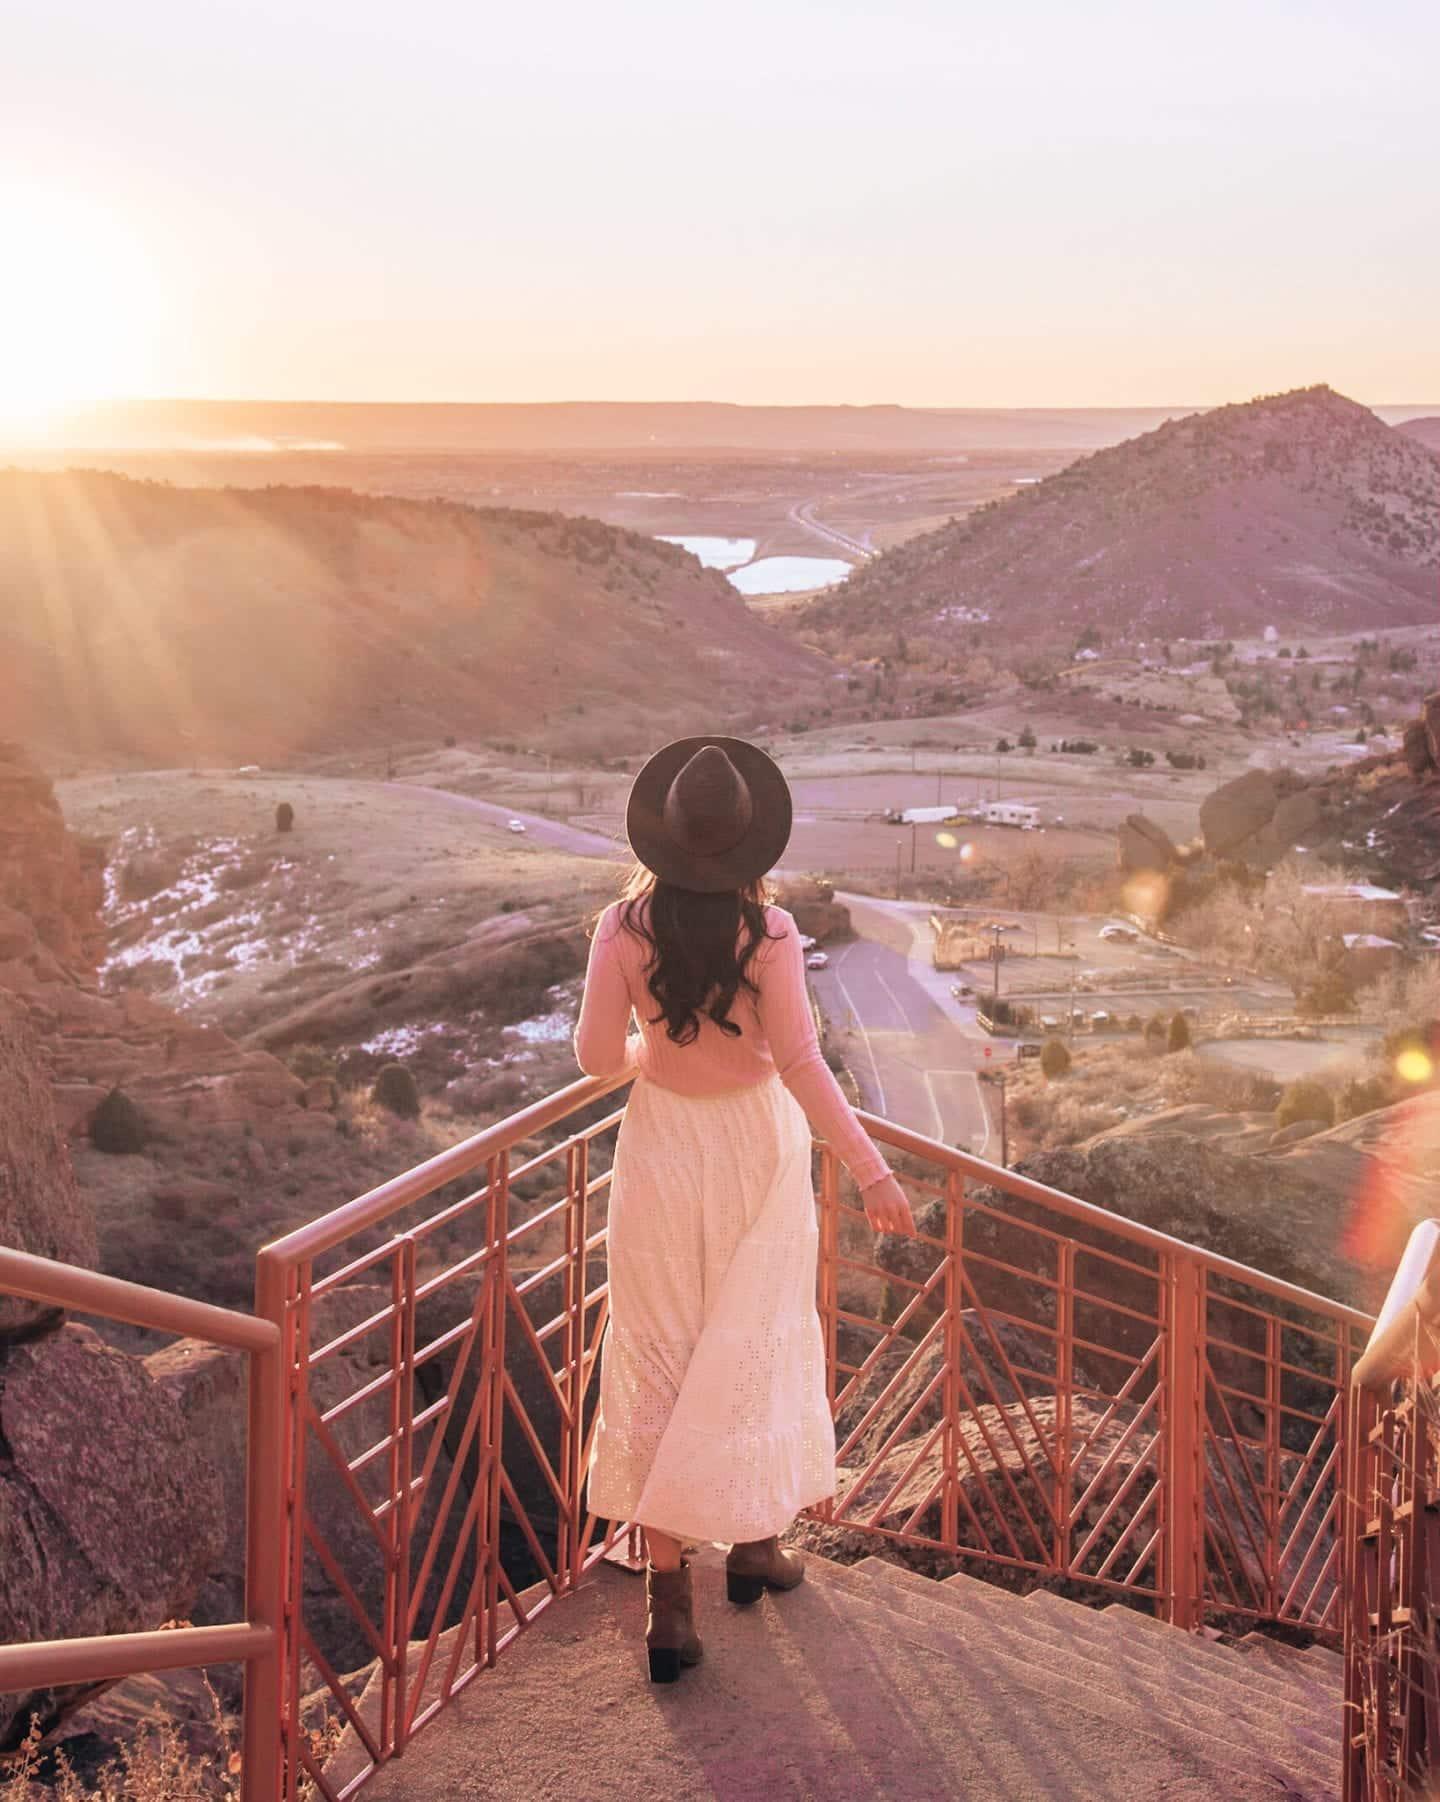 Sunrise at Red Rocks Amphitheater in Morrison